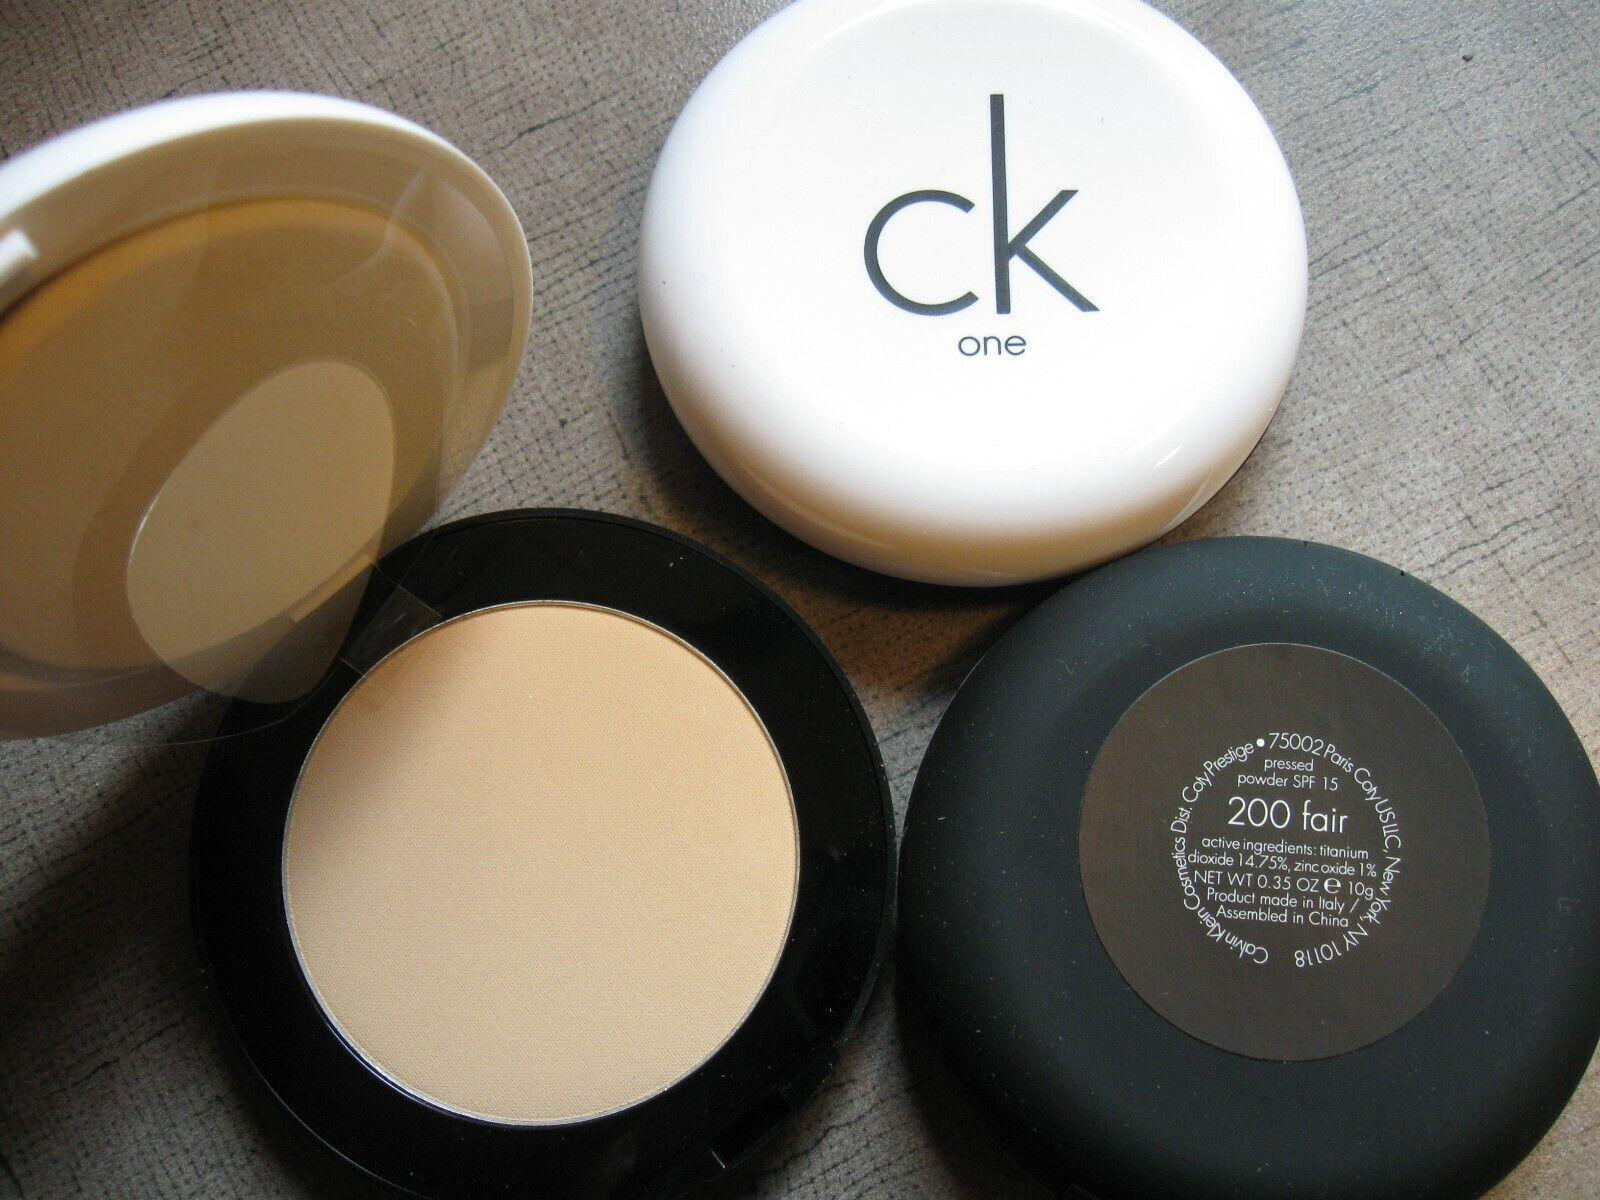 1 - Calvin Klein ck one Pressed Powder SPF 15 200 fair  35 oz